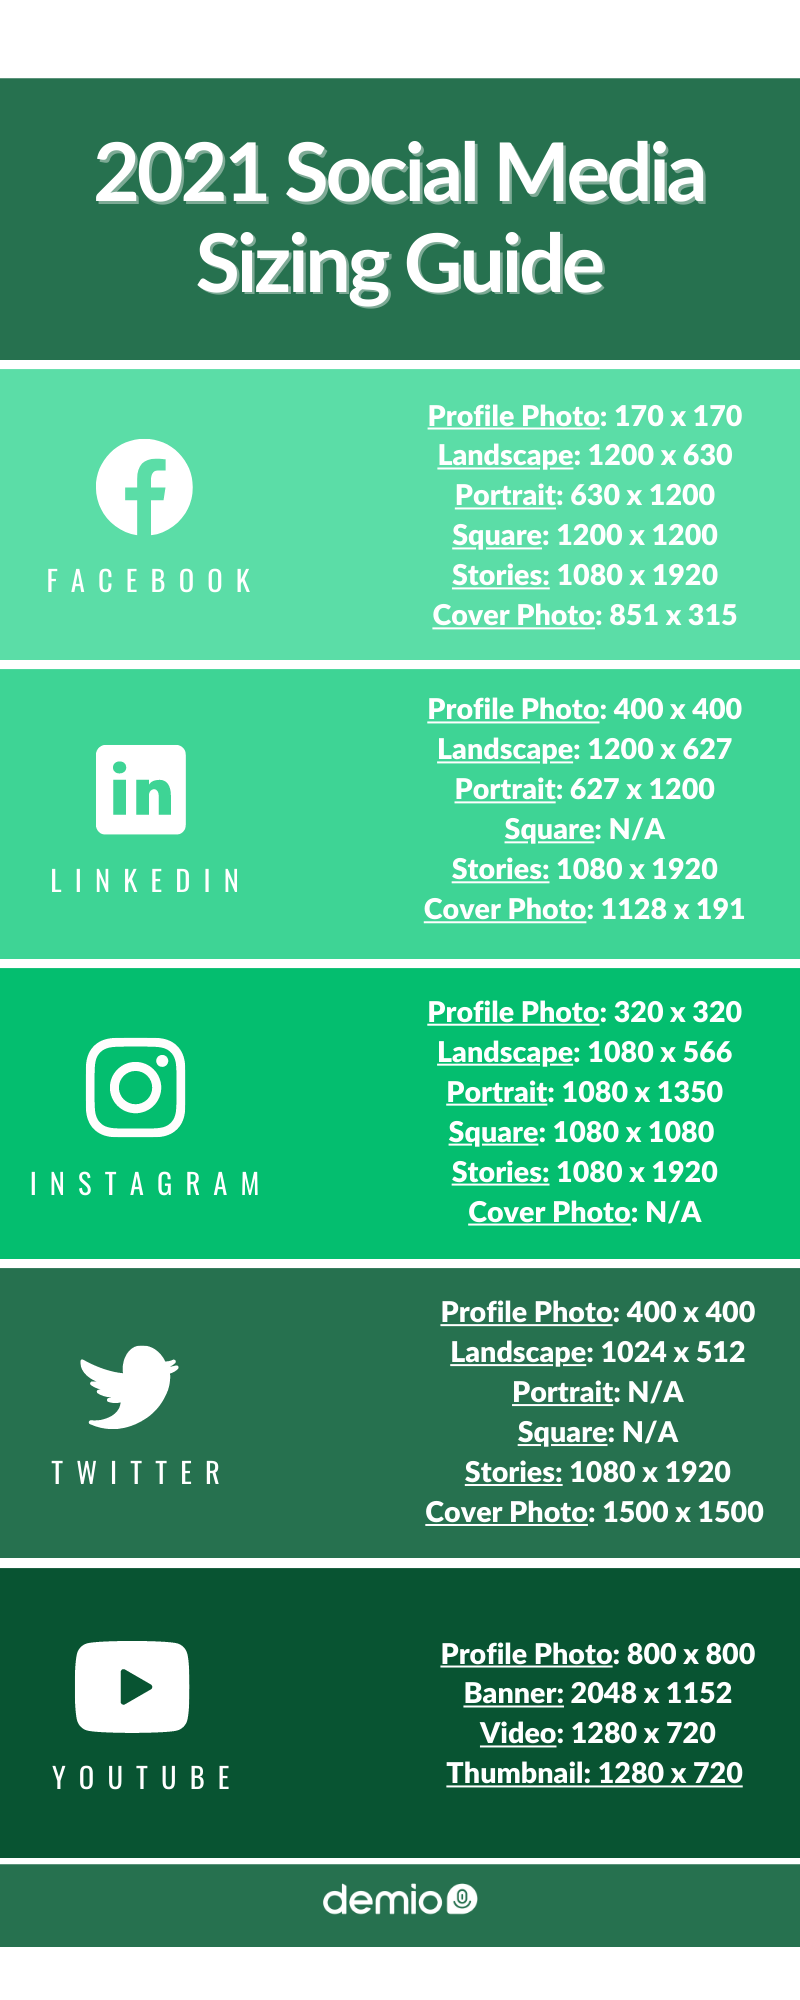 2021 social media sizing guide chart